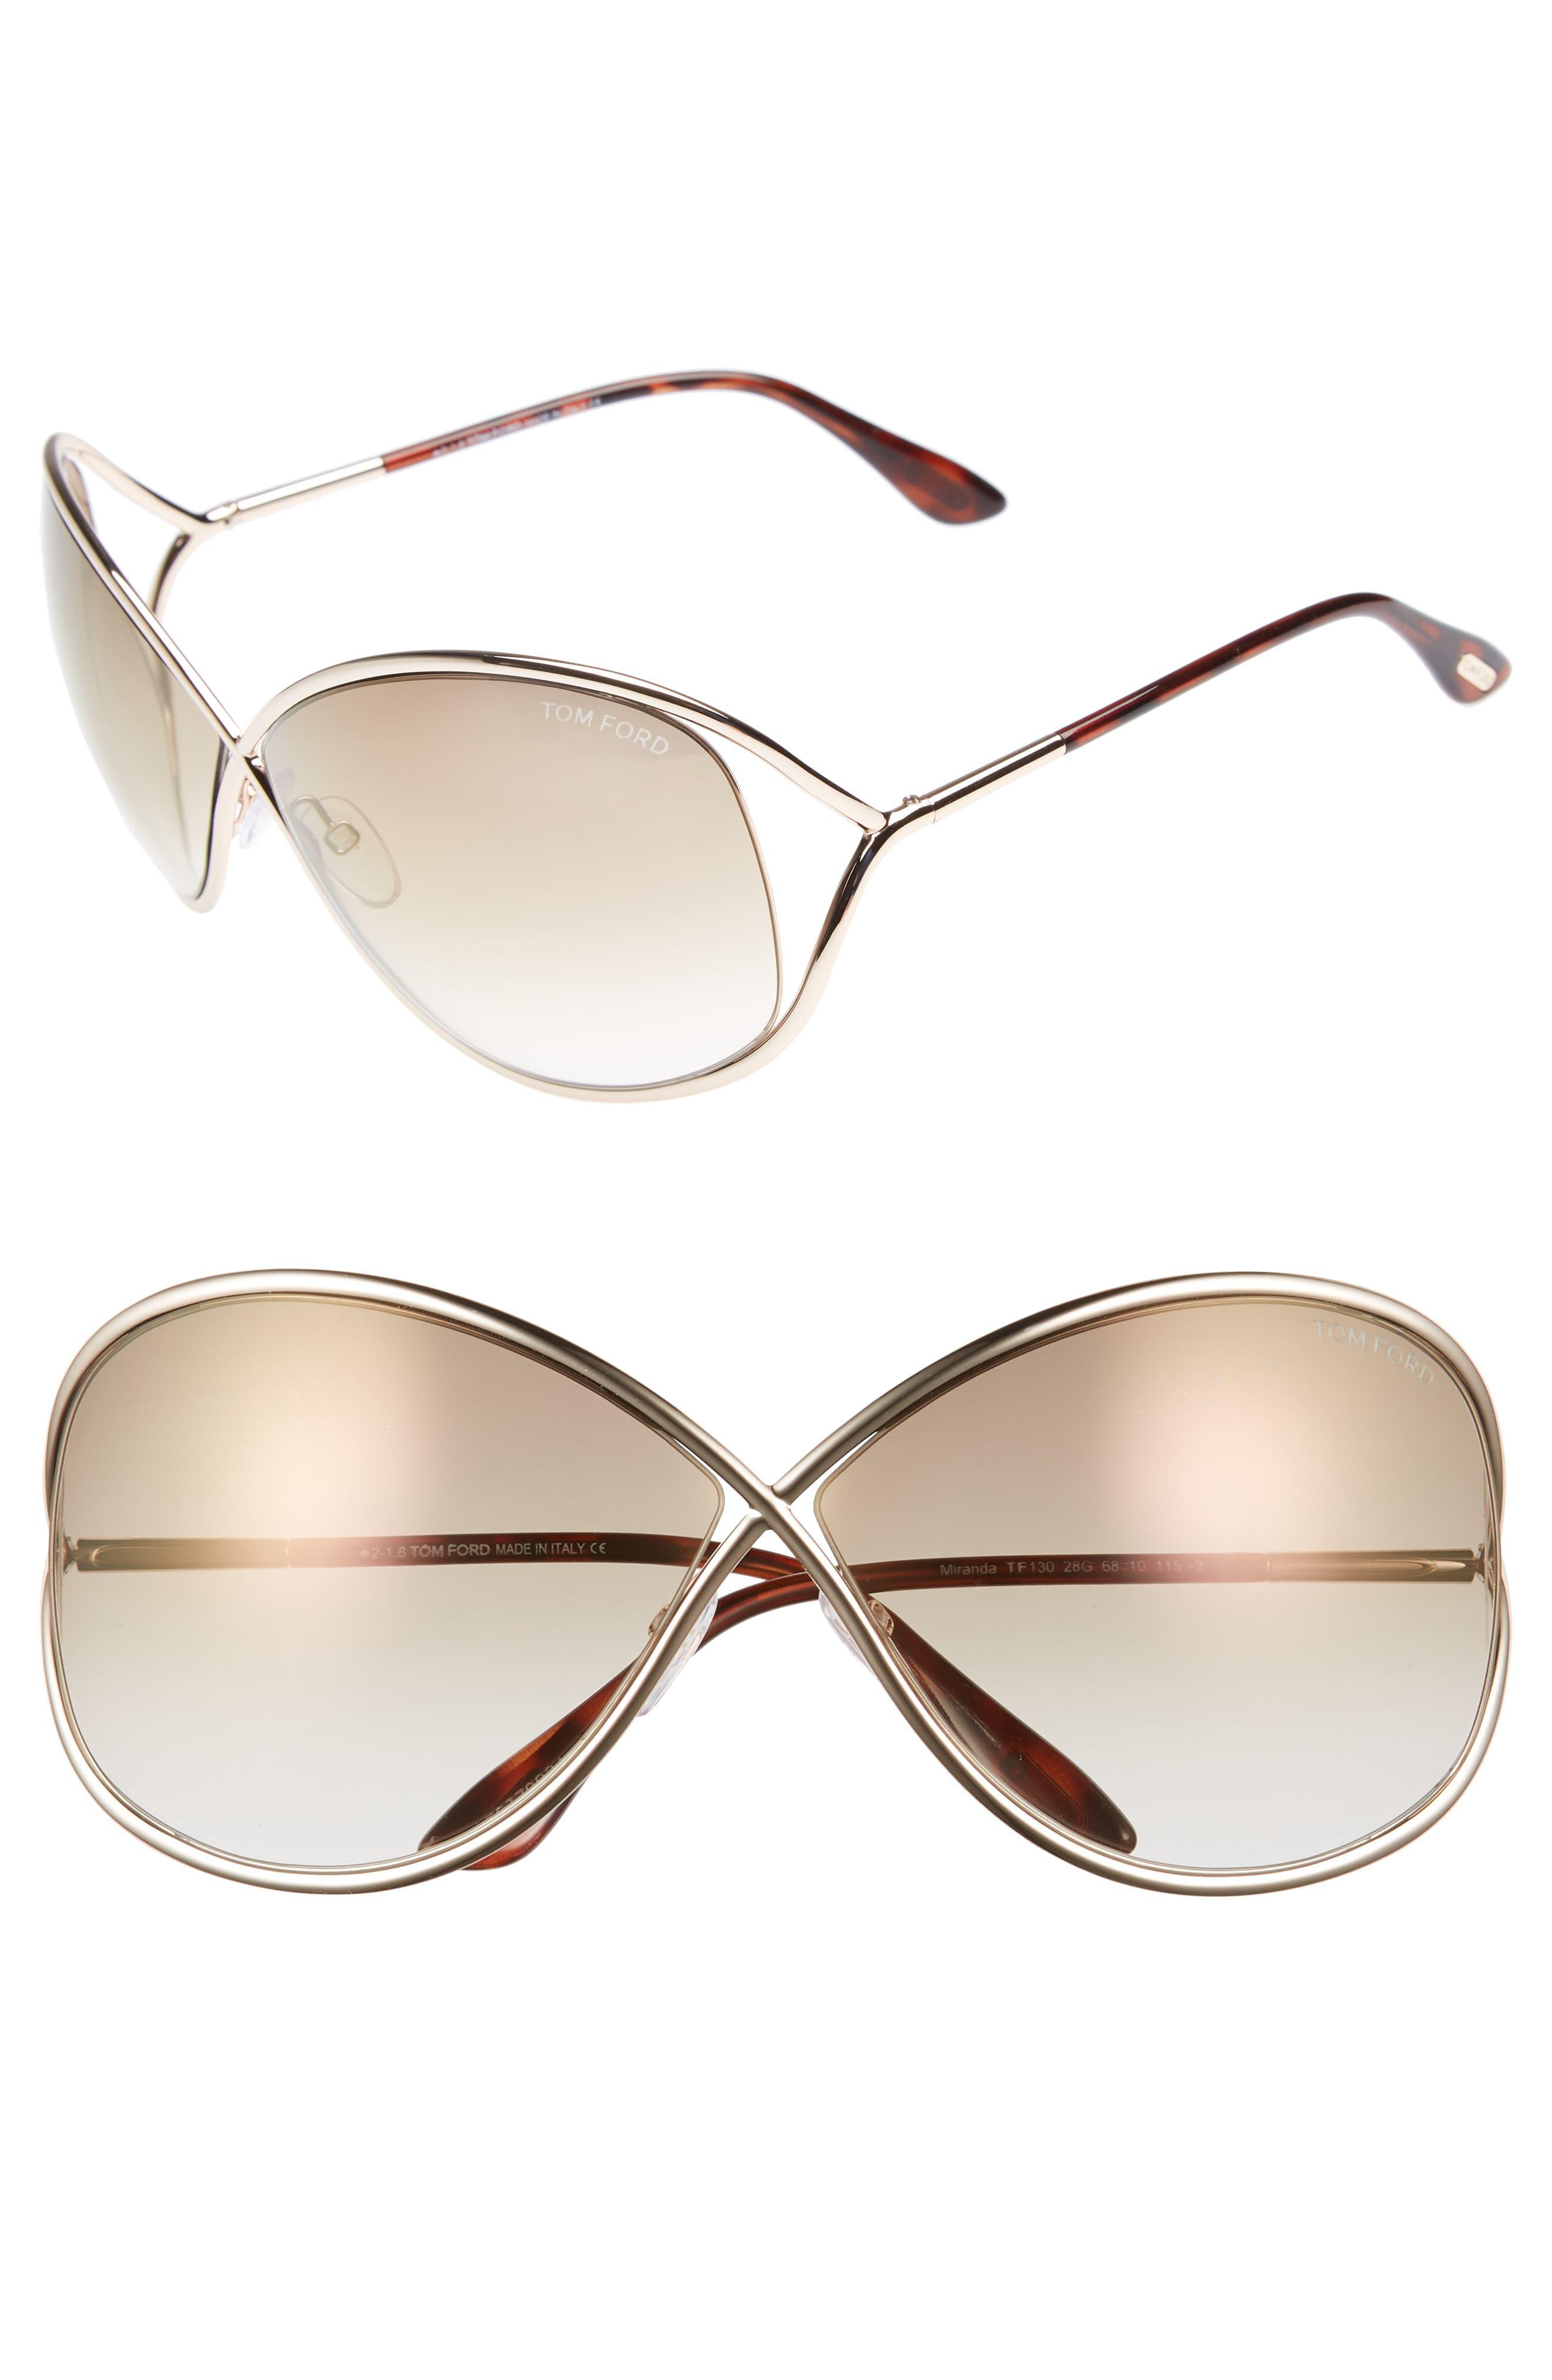 Miranda 68mm Open Temple Oversize Metal Sunglasses,                         Main,                         color, Shiny Rose Gold/ Brown